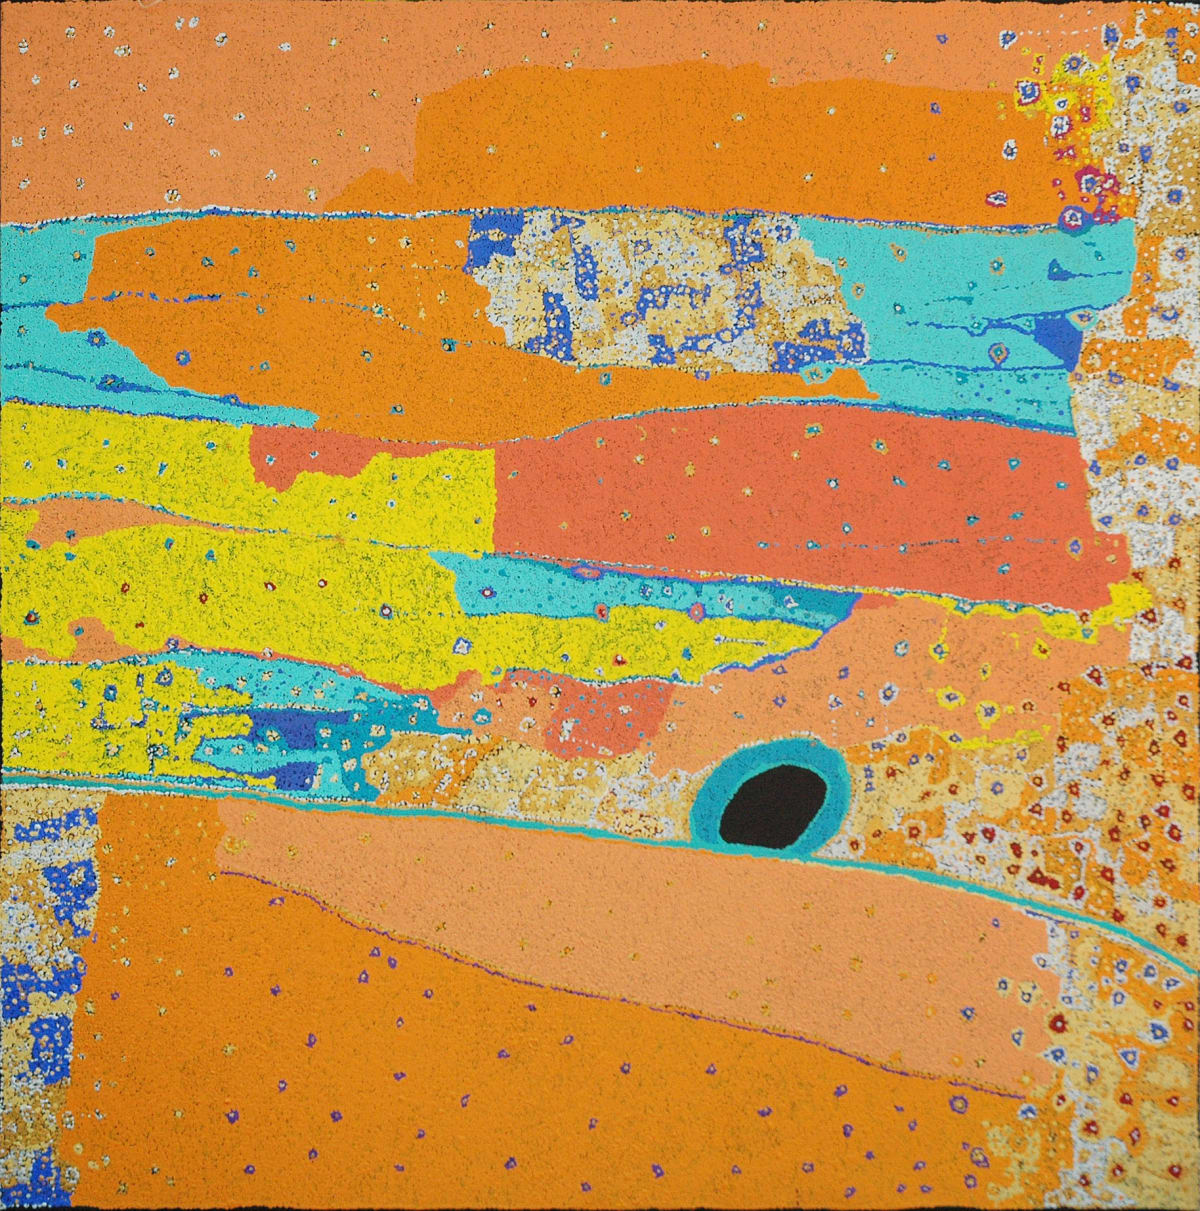 Daniel Walbidi Kirriwirri & Kulyakartu acrylic on linen 121.5 x 120 cm